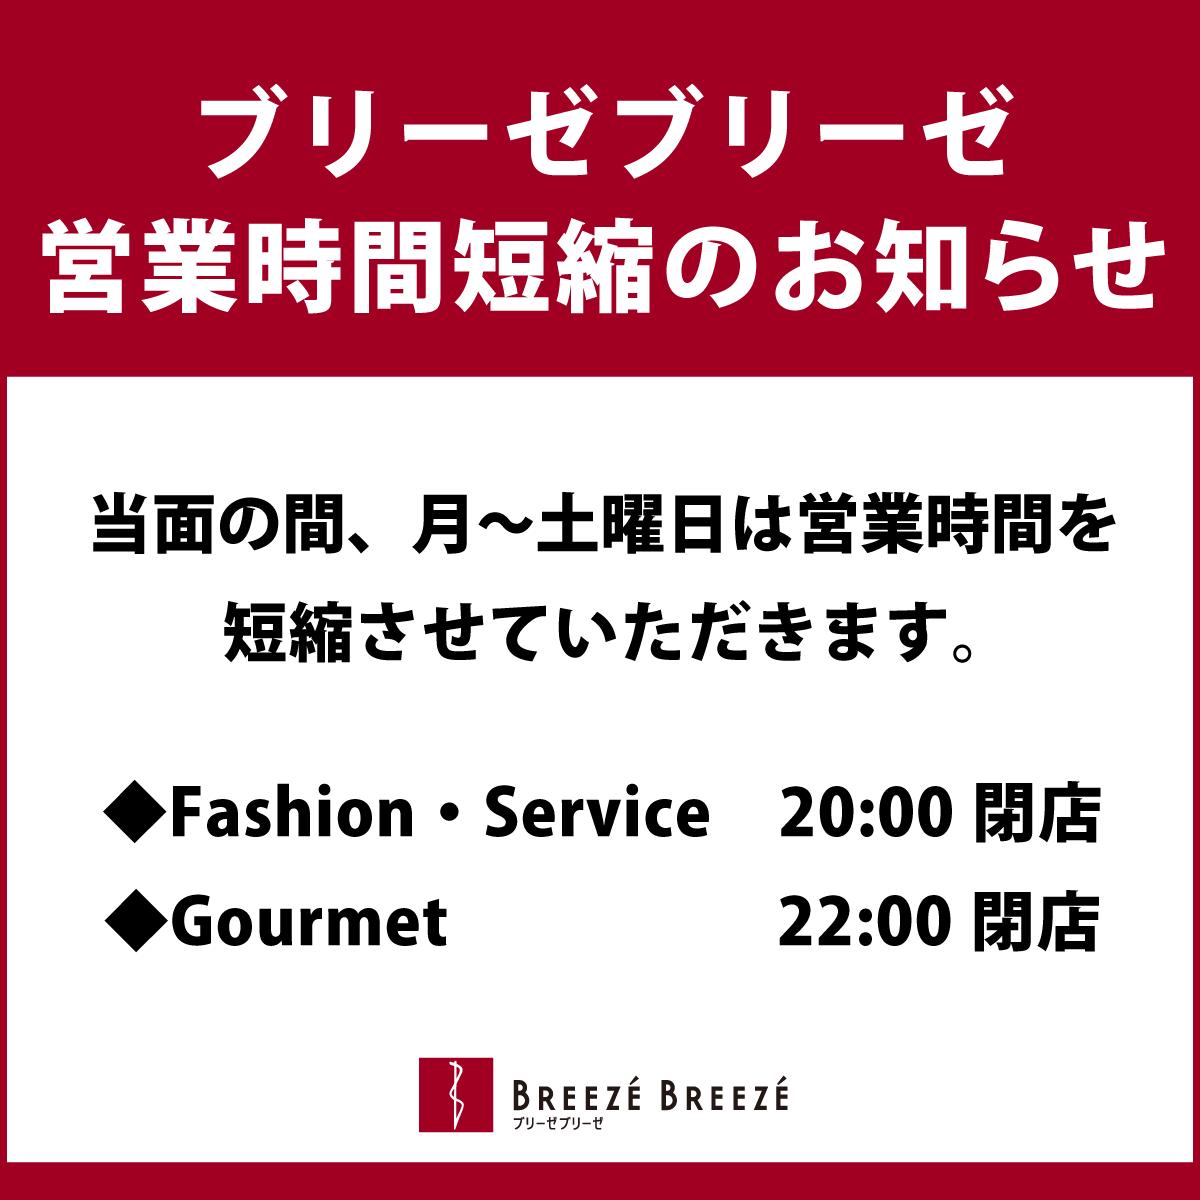 ID00000048 20200327 132143 img - 梅田ブリーゼ店 営業時間短縮延長のお知らせ